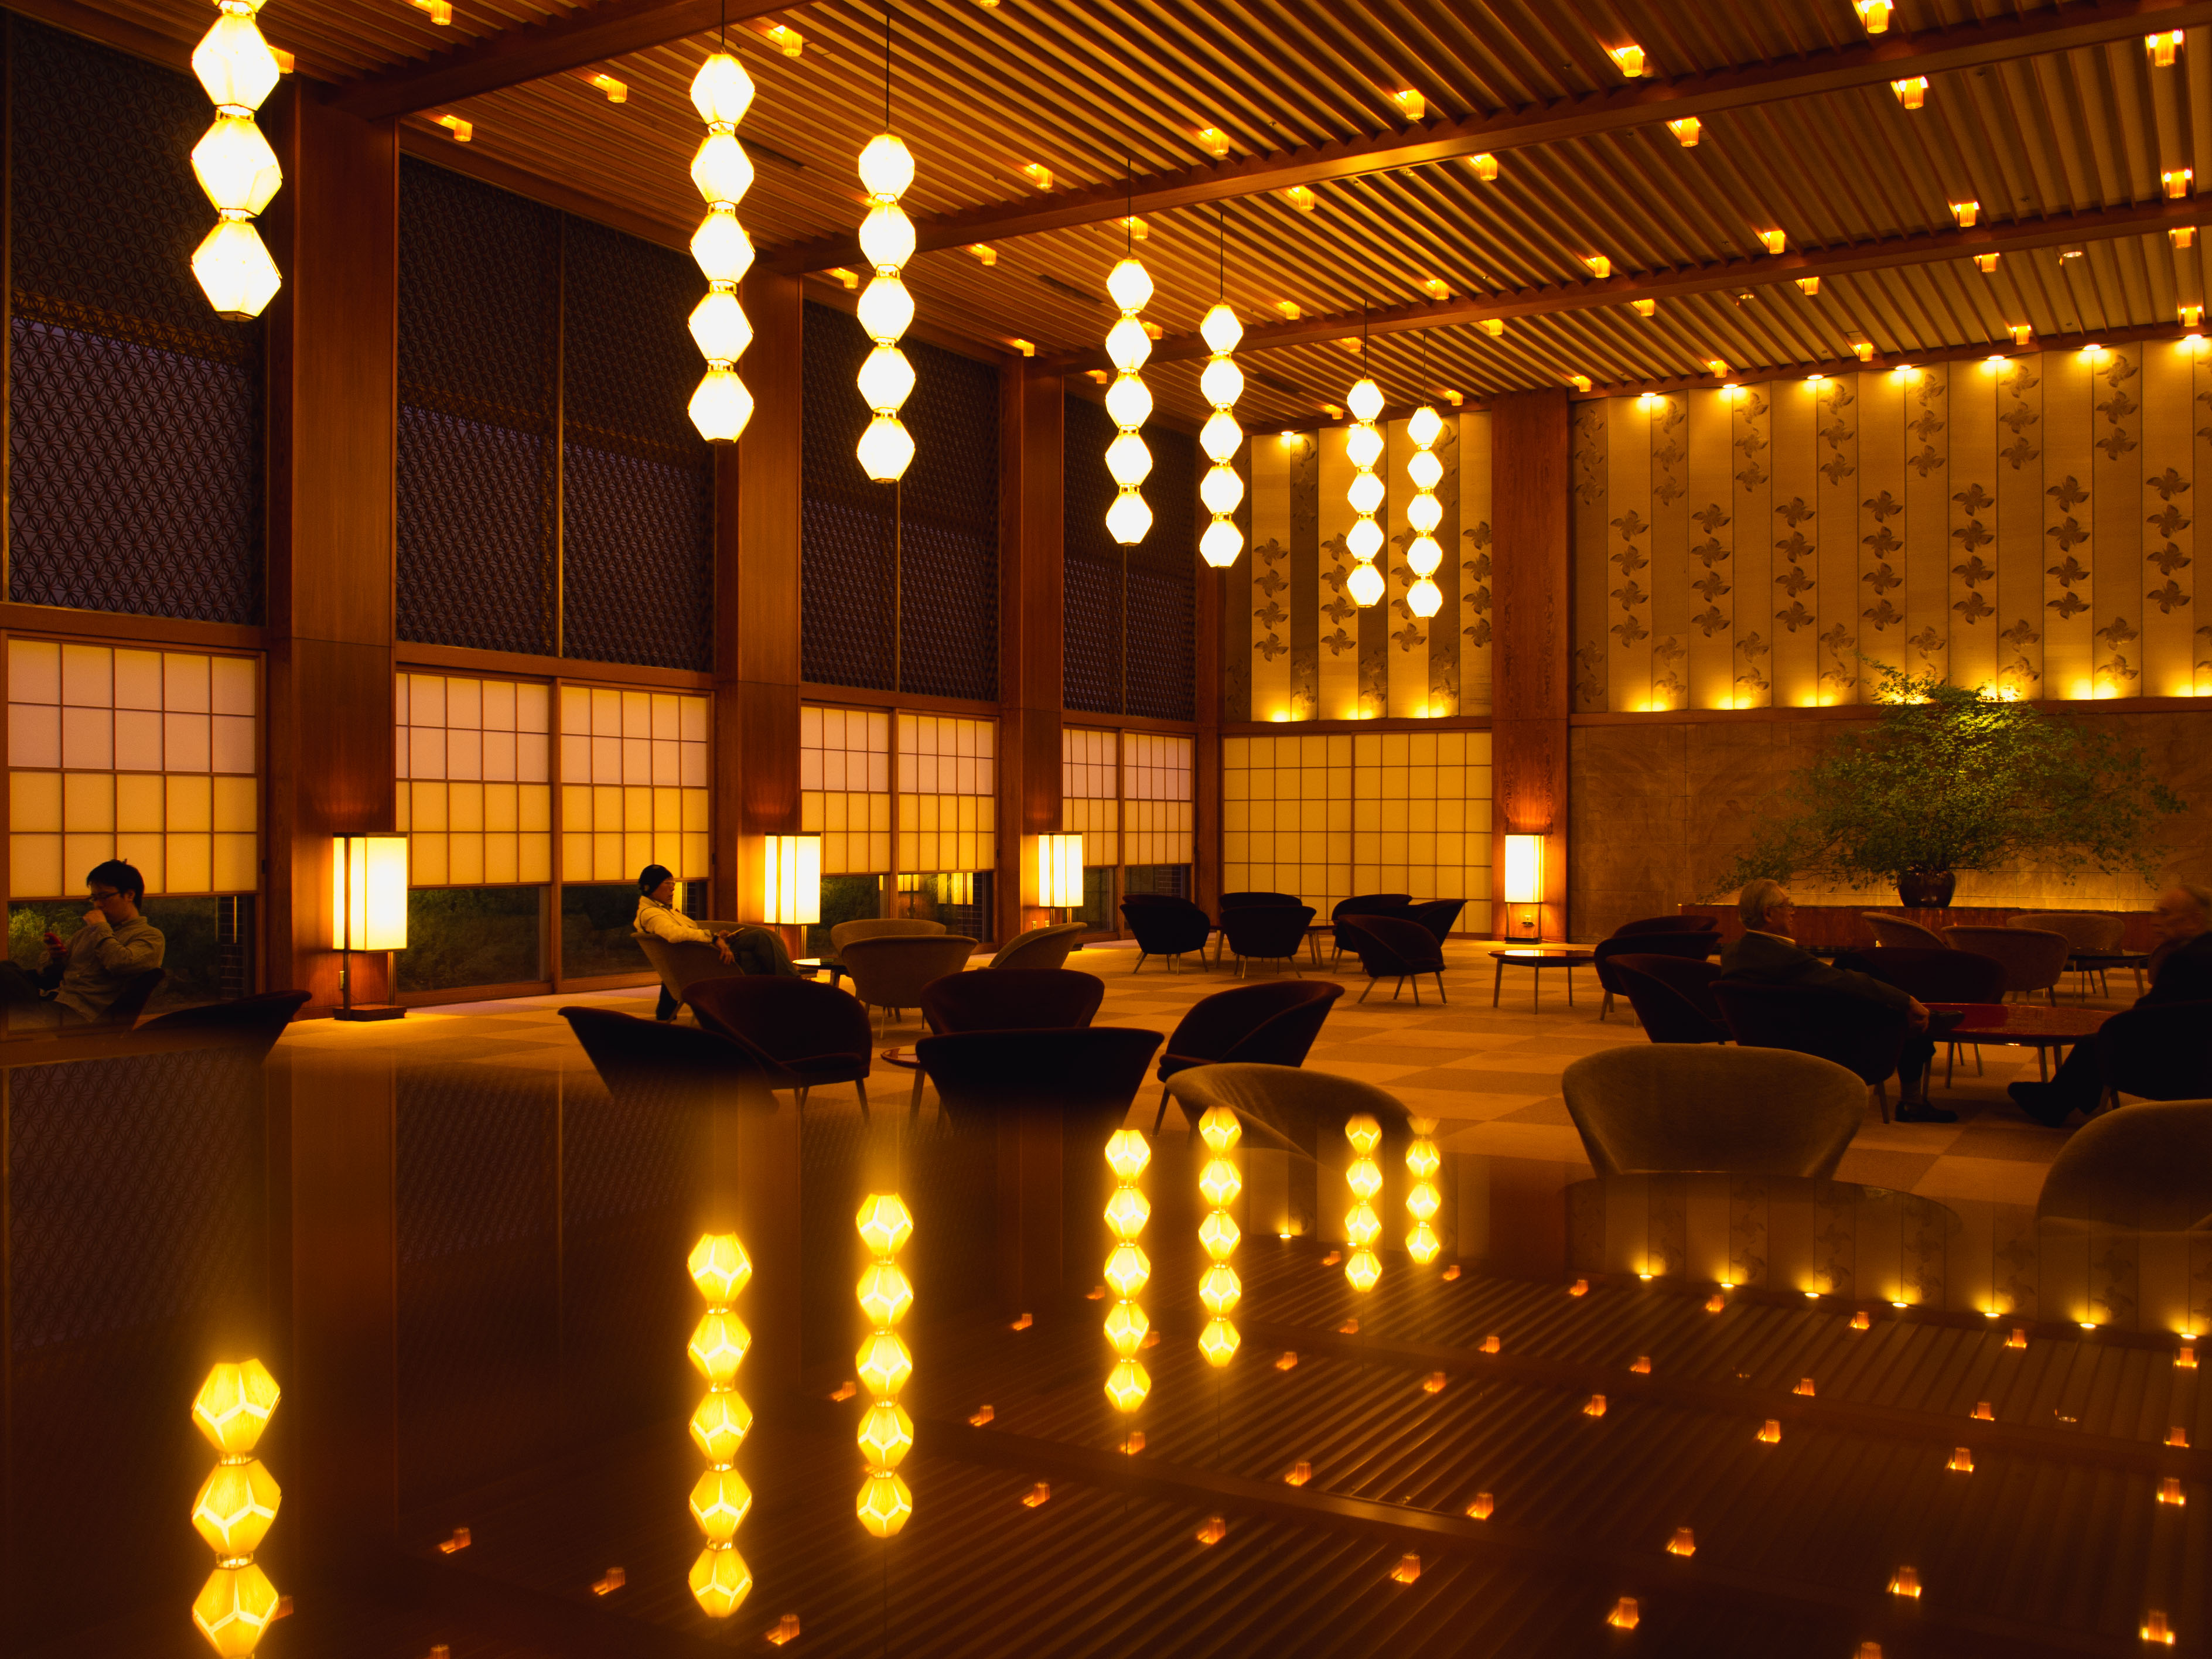 Okura hotel tokyo last chance to taste the 60s tokyo cheapo for Design hotel tokyo